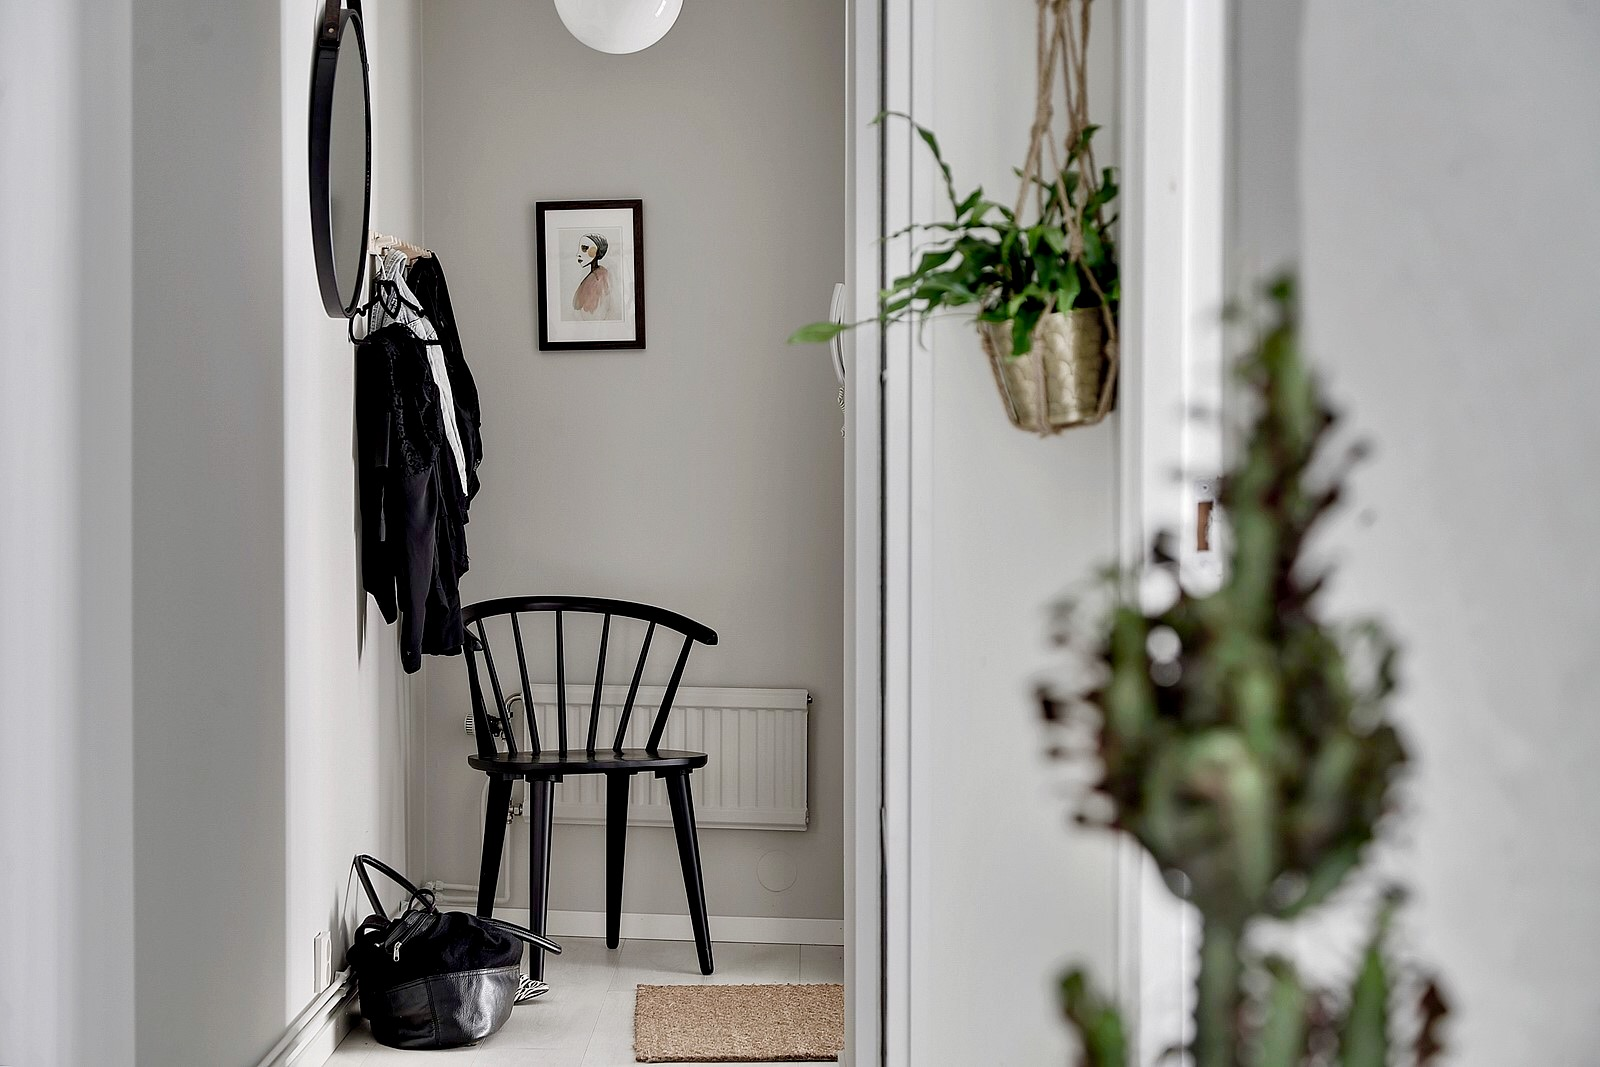 коридор кашпо стул зеркало одежда